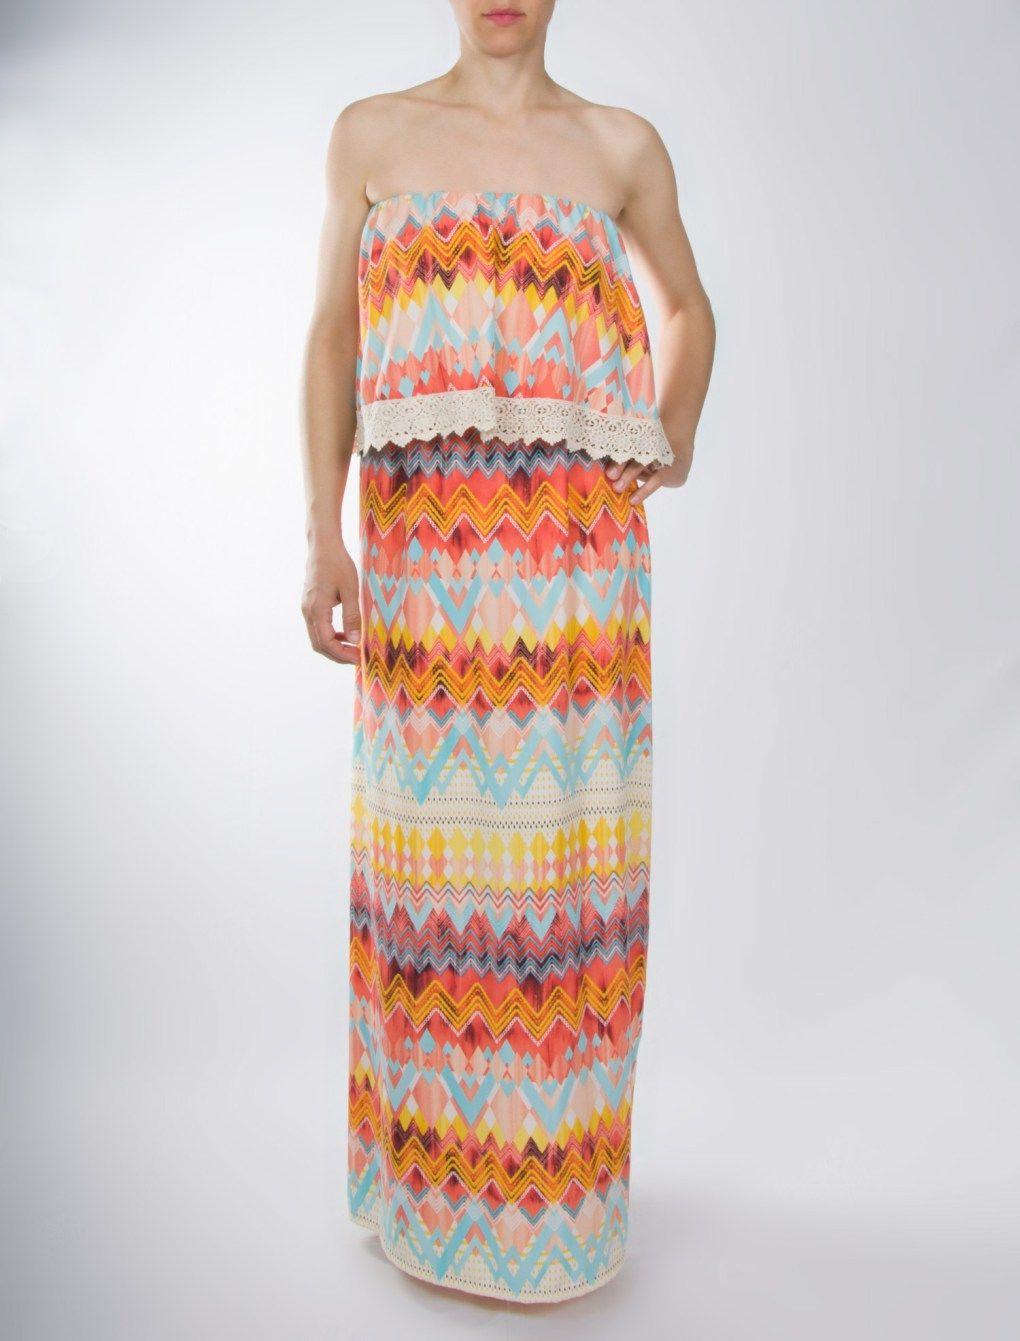 fd0601ddd8fe Φόρεμα missoni maxi στράπλες με βολάν και δαντέλα Σύνθεση  97% viscose 3%  elas Ελληνικής κατασκευής